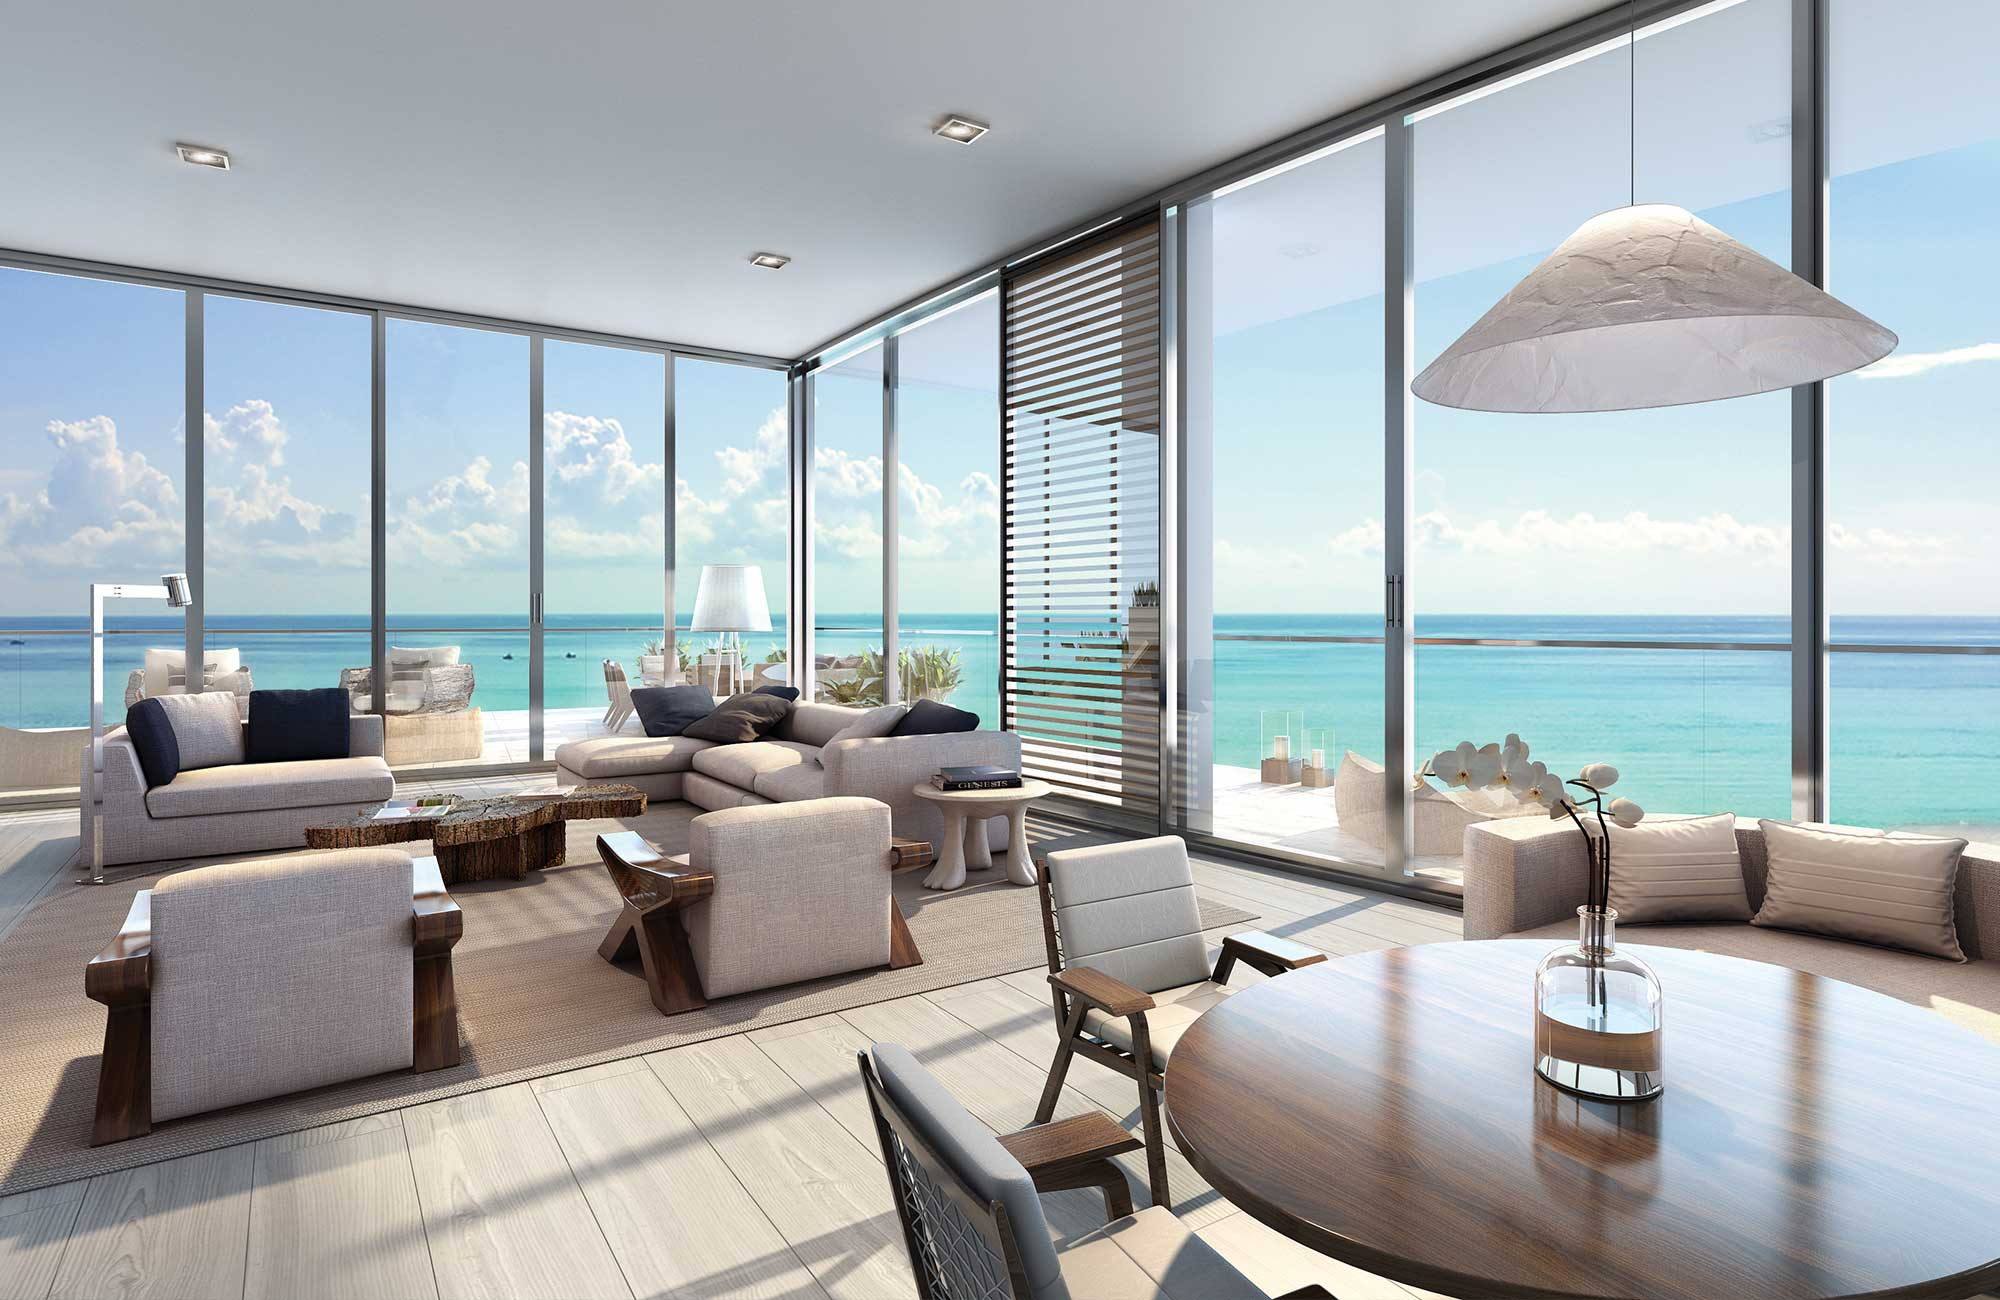 Auberge Beach Residences Fort Lauderdale, FL